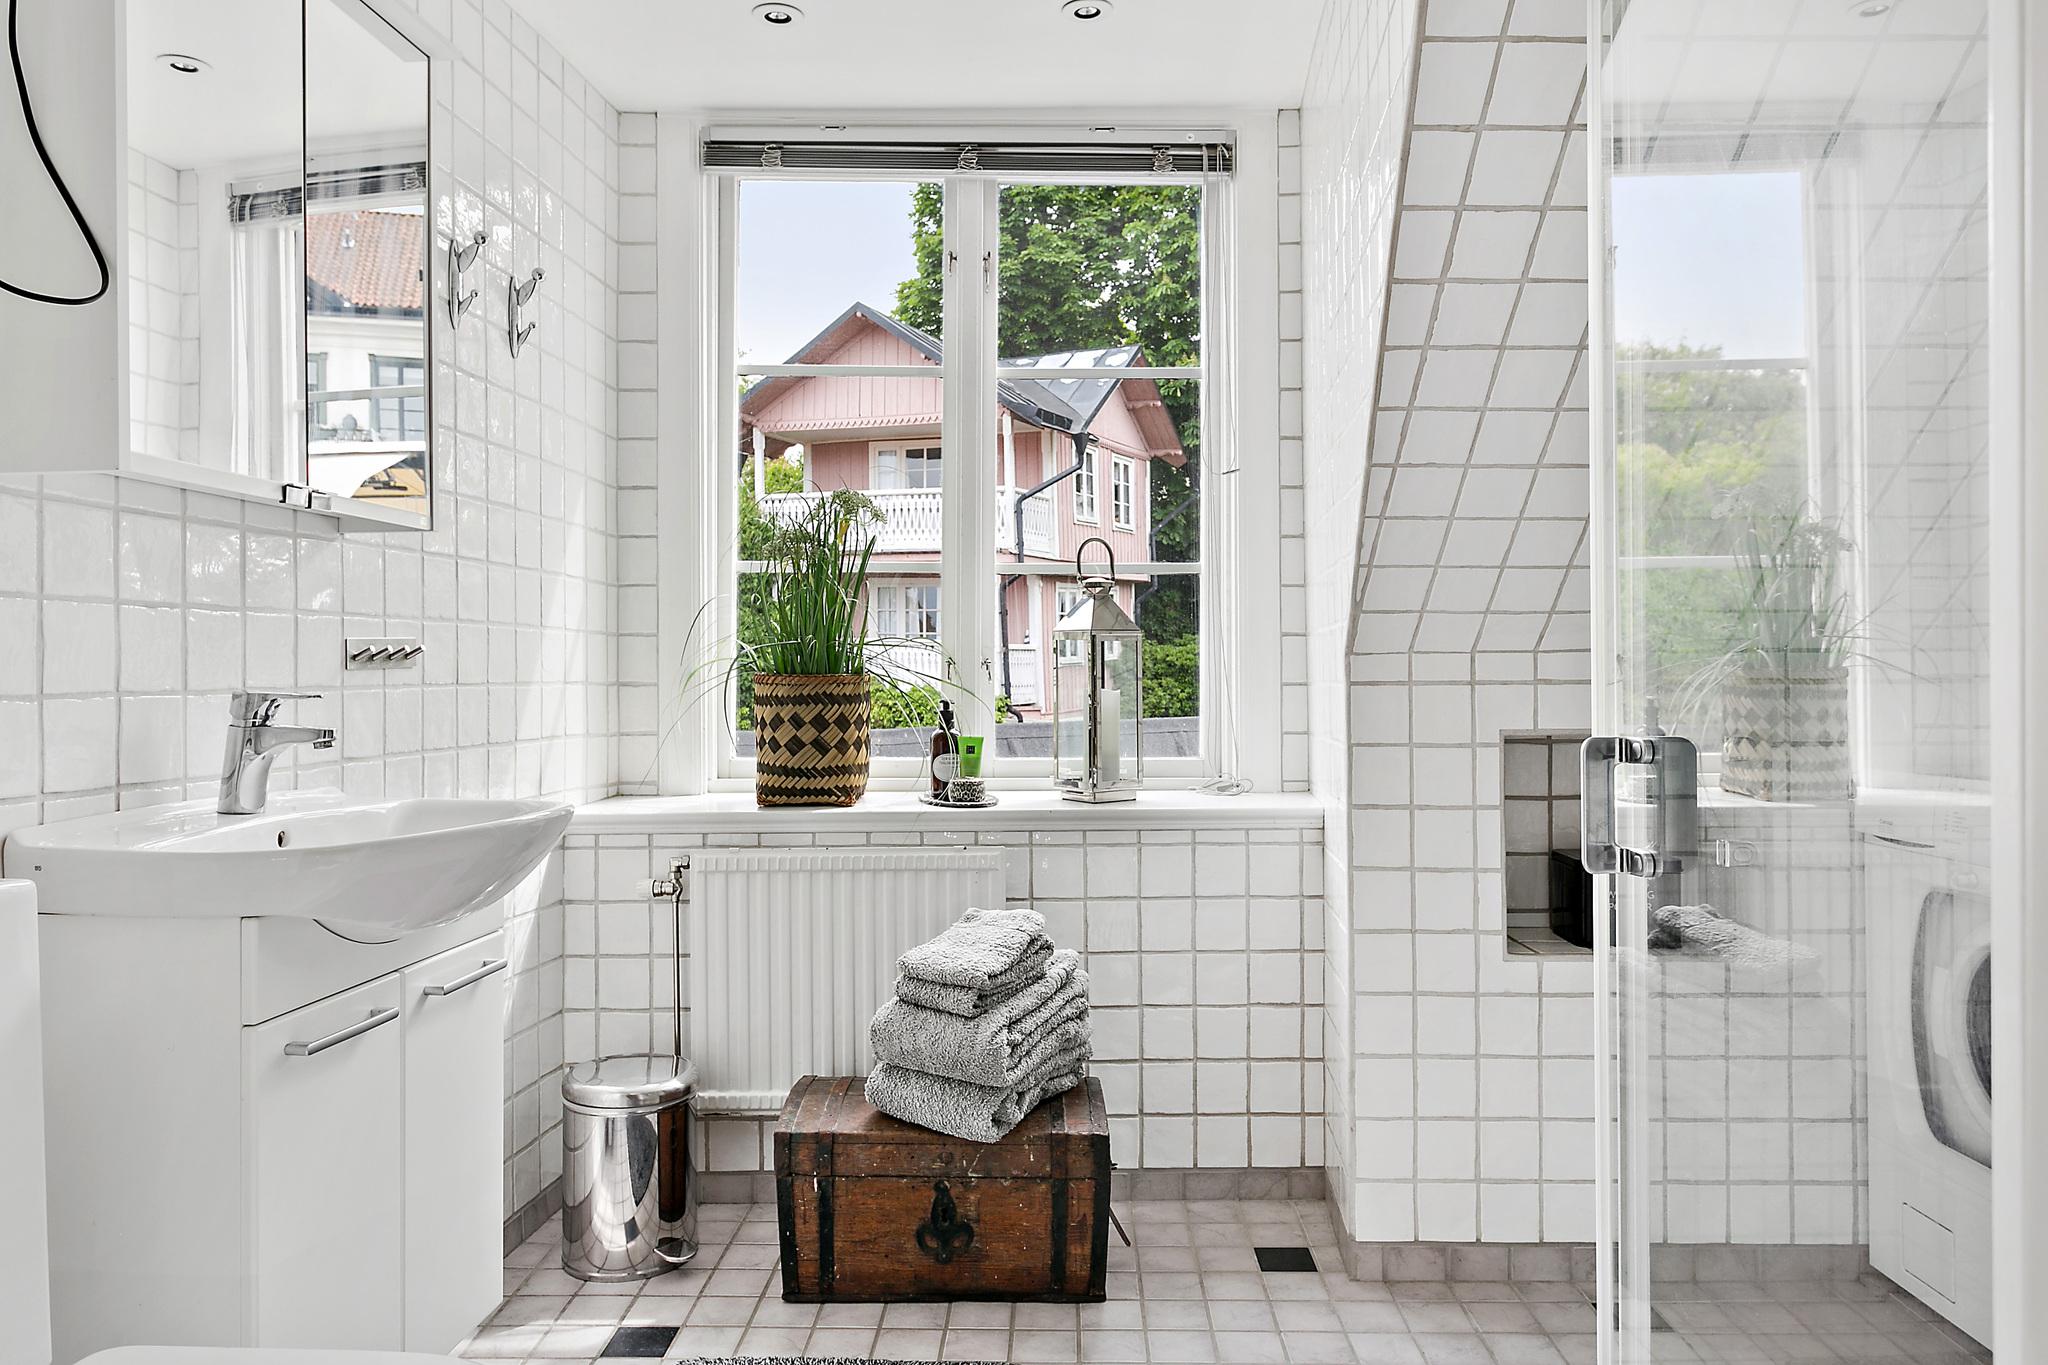 мансарда окно сундук белая плитка душевая раковина